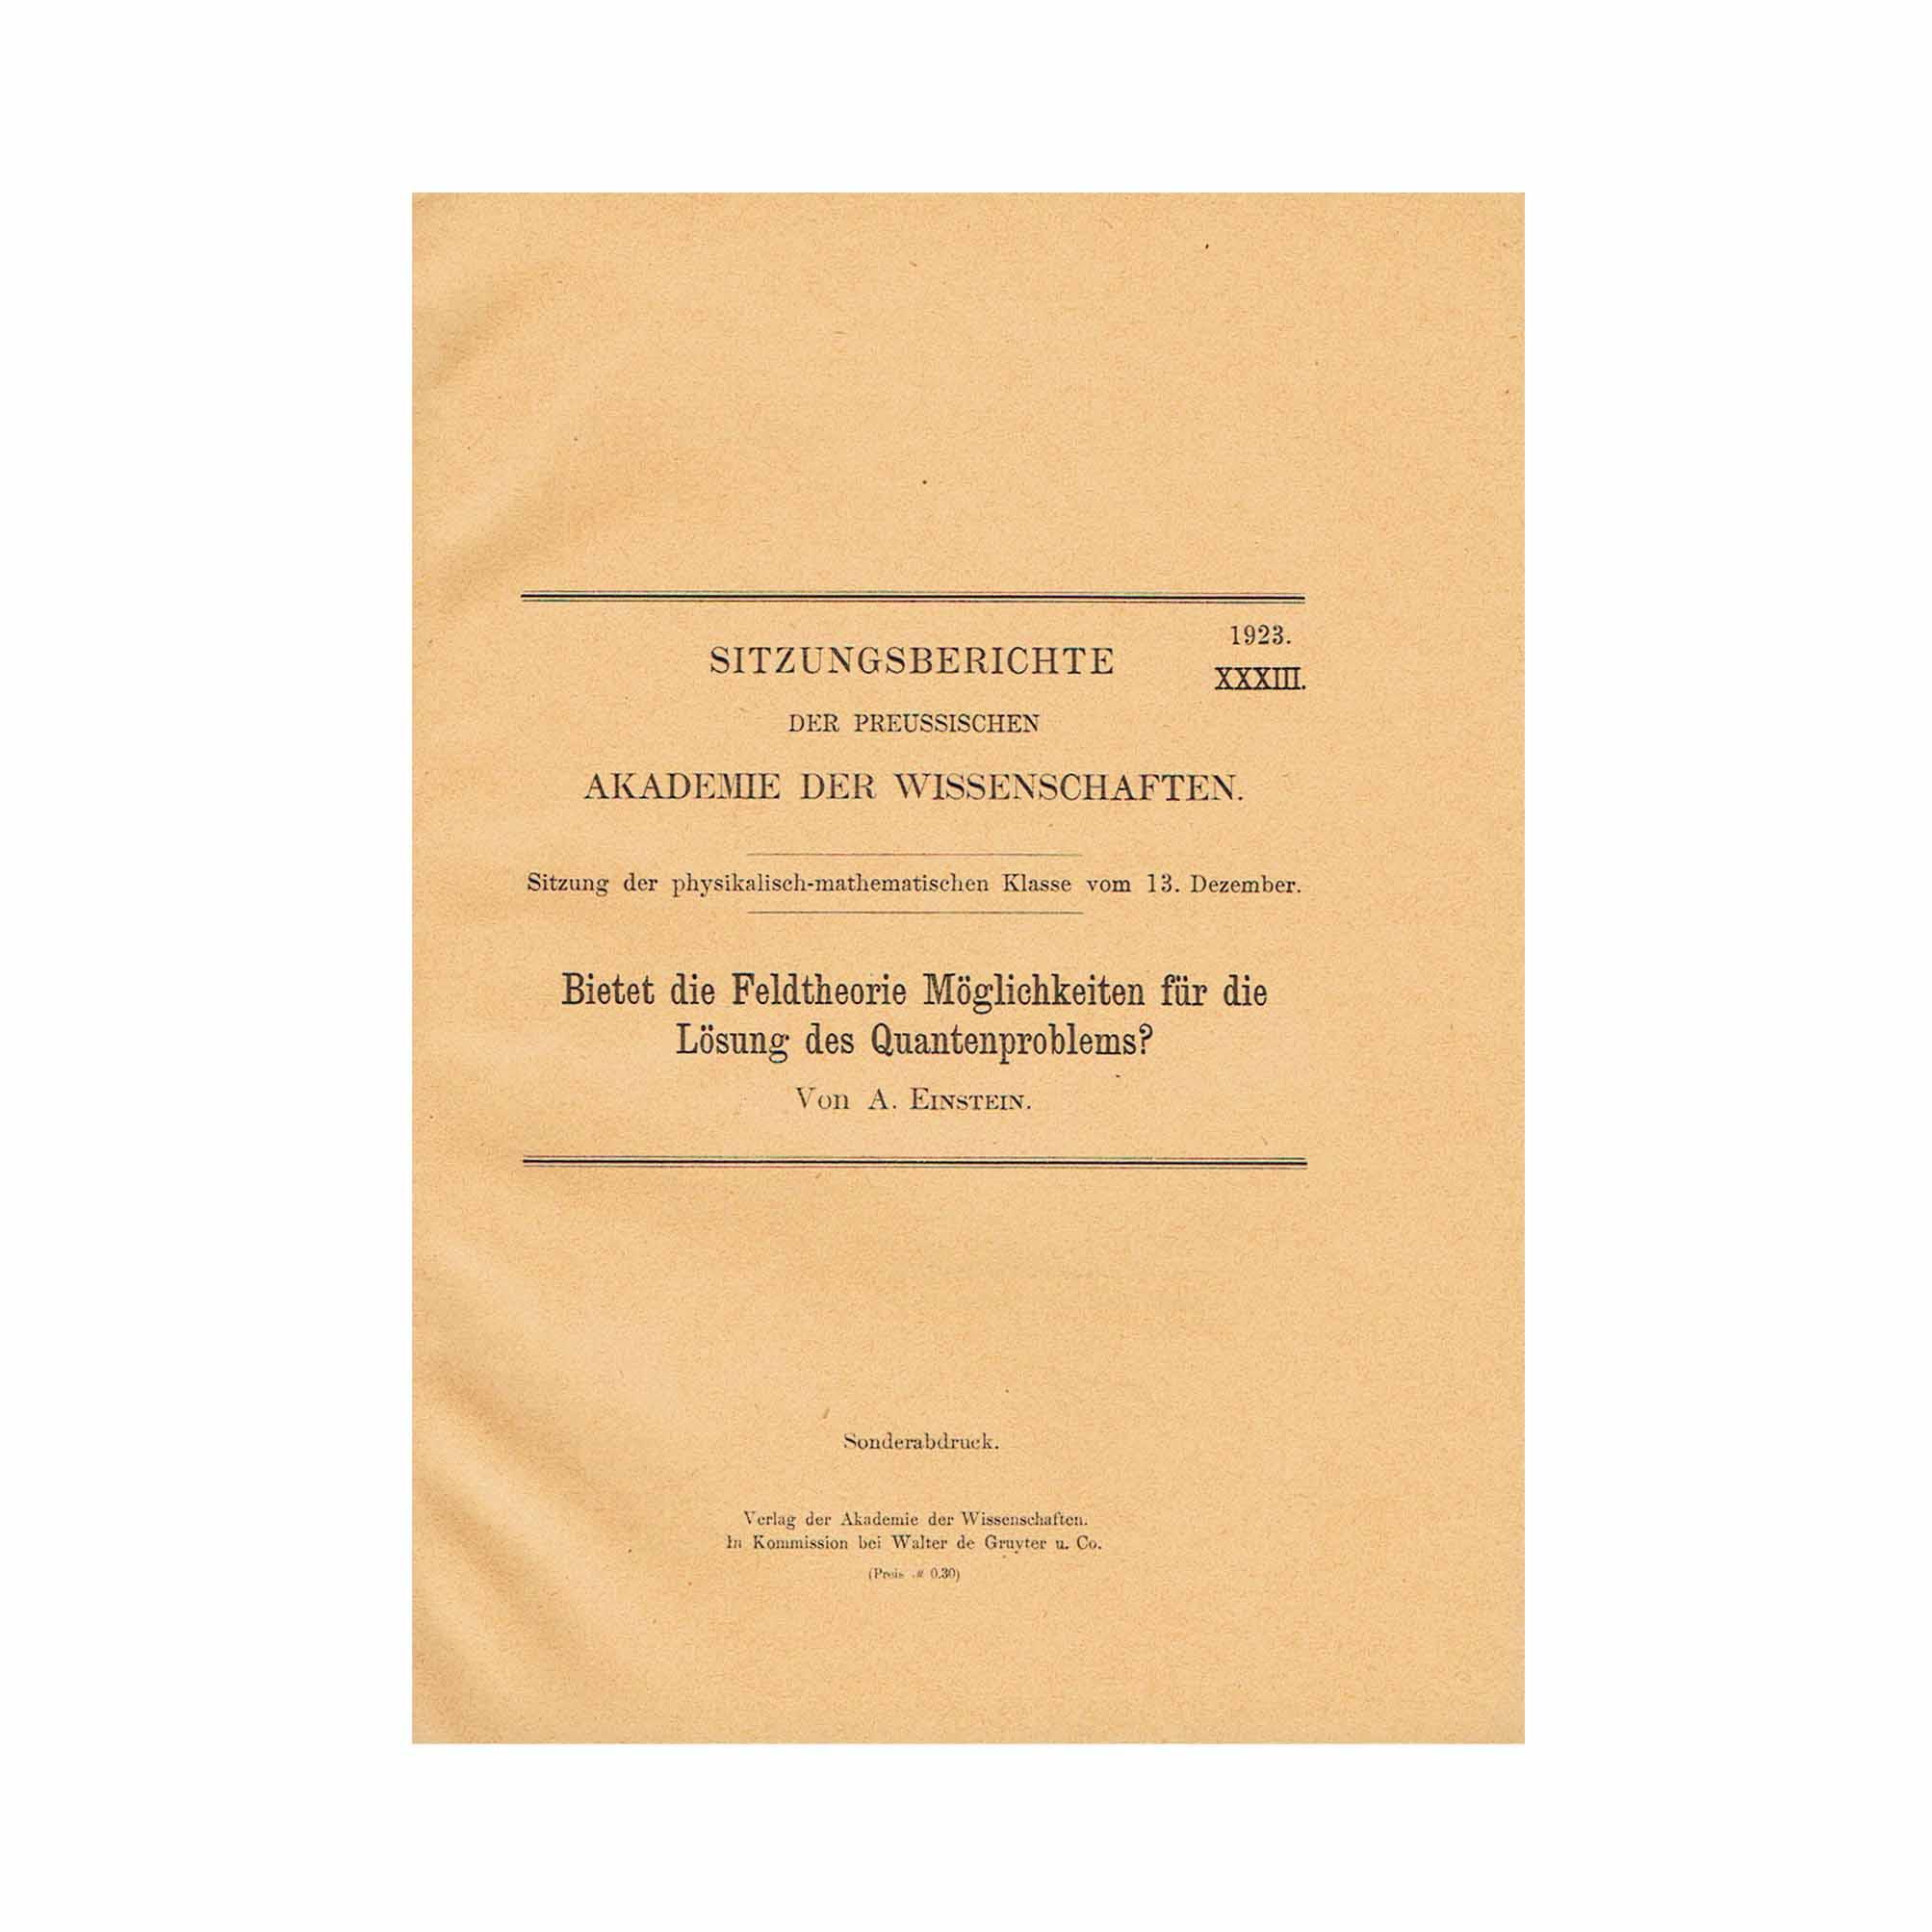 5731-Einstein-Field-Theory-Quantum-Akademie-XXXIII-1923-SA-Cover-recto-N.jpg